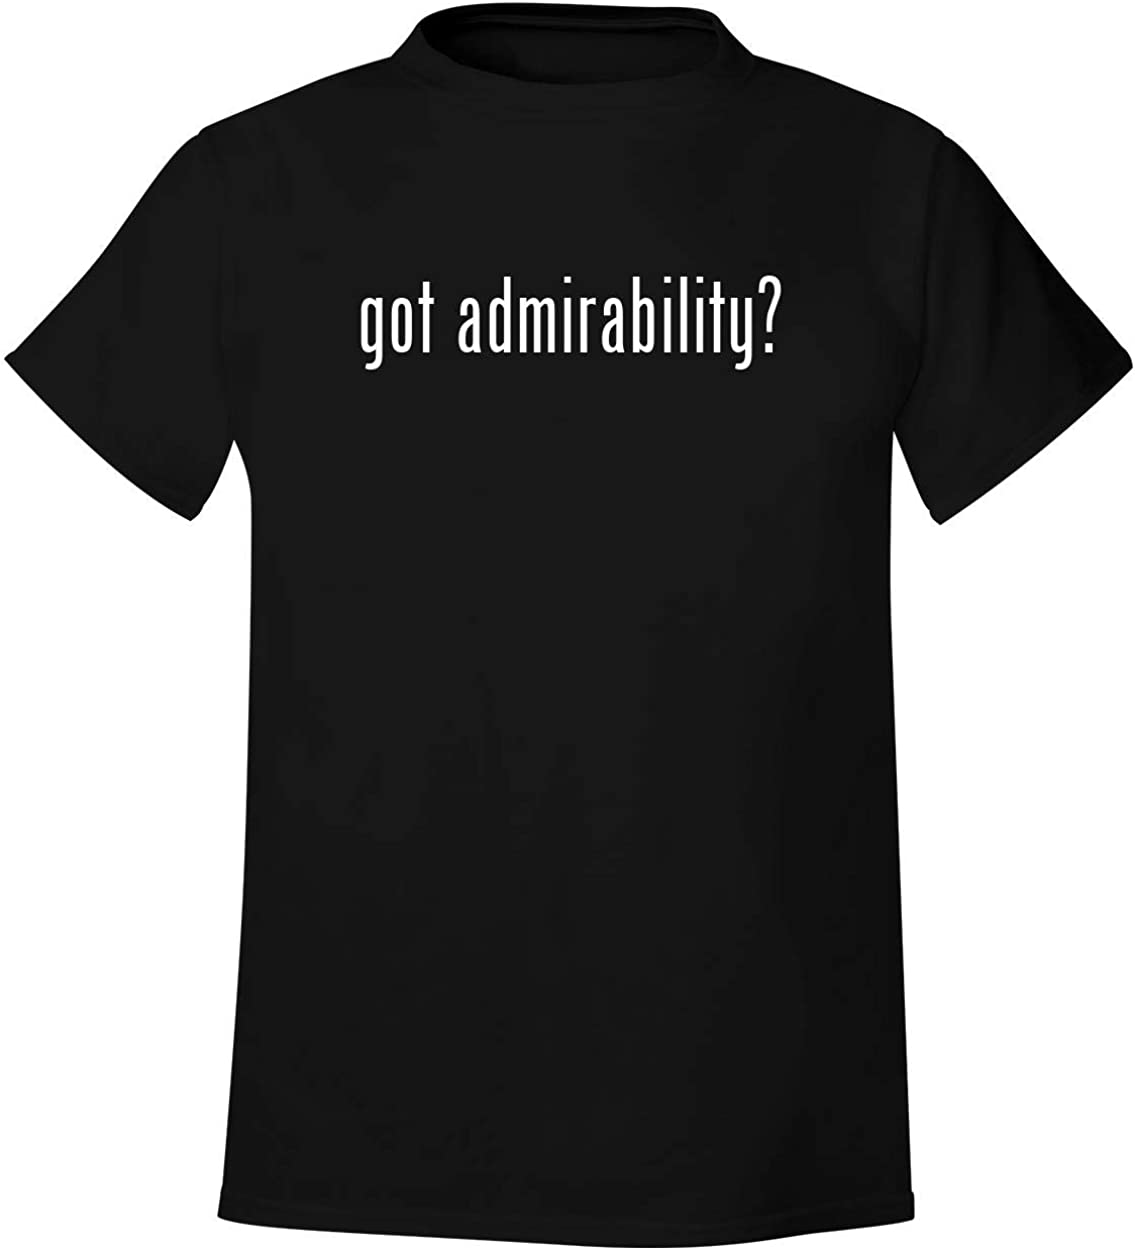 got admirability? - Men's Soft & Comfortable T-Shirt